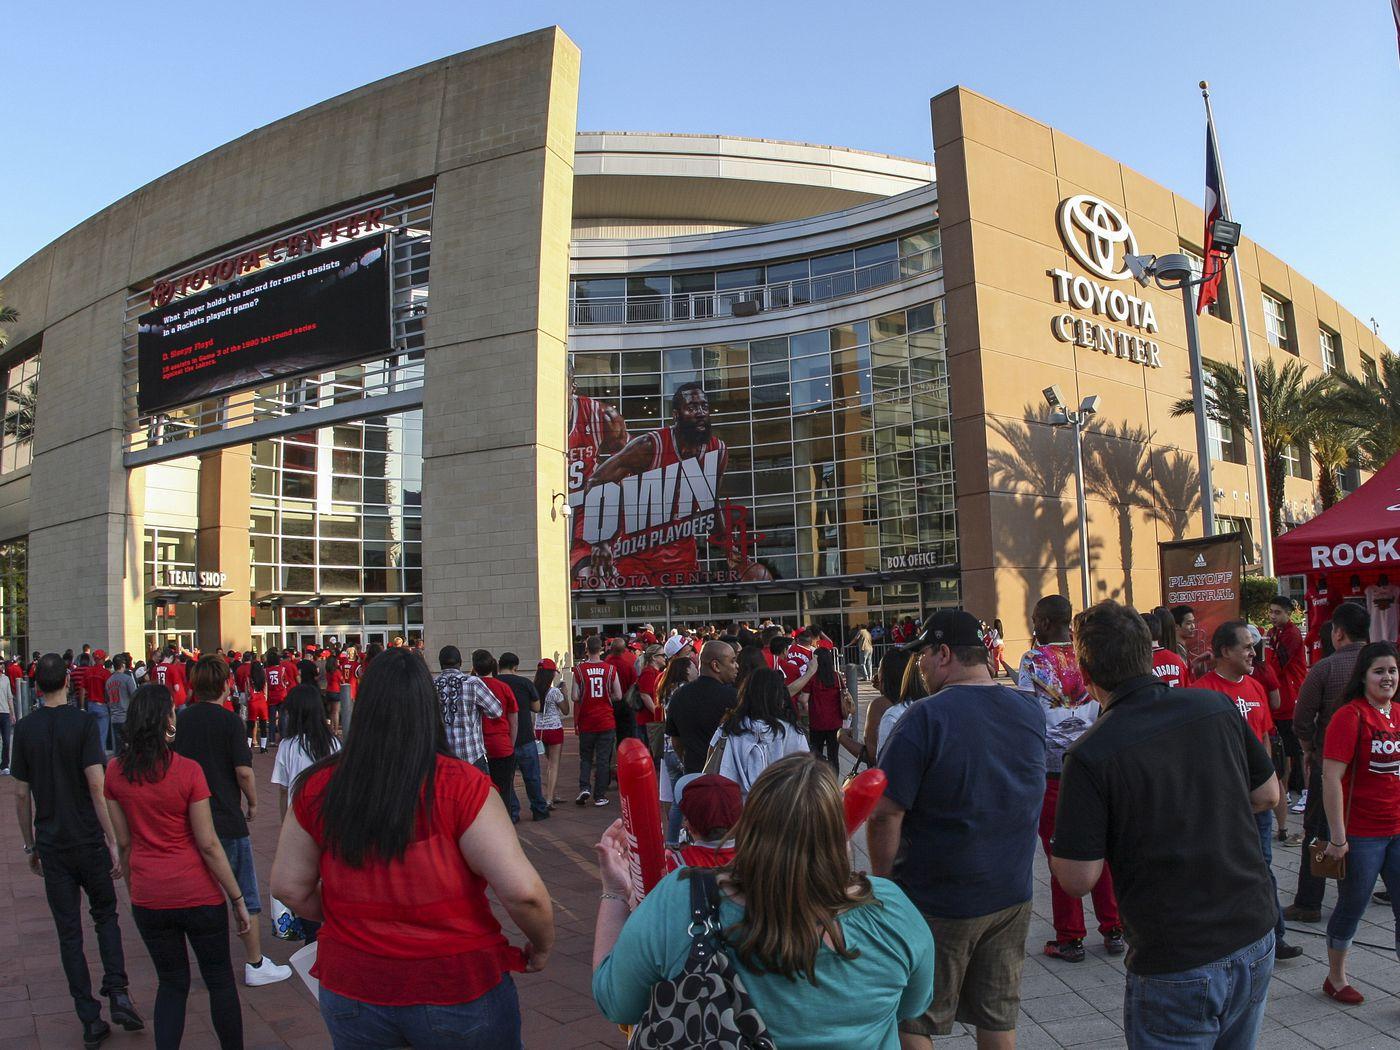 NHL Expansion: Houston Ready For Professional Hockey